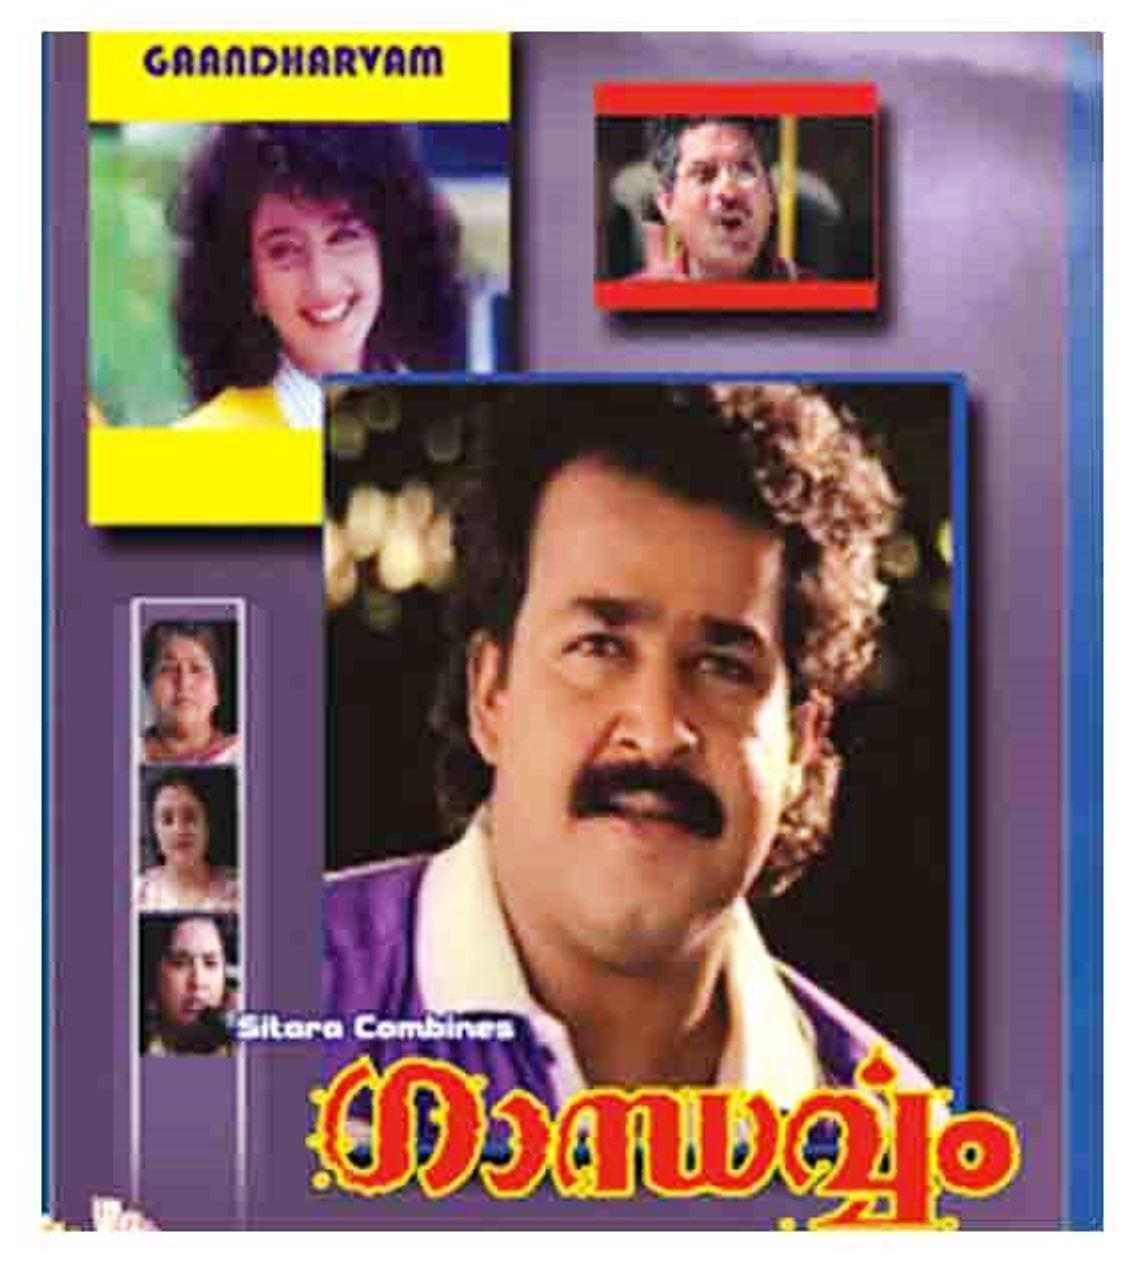 Gandharvam Movie Poster